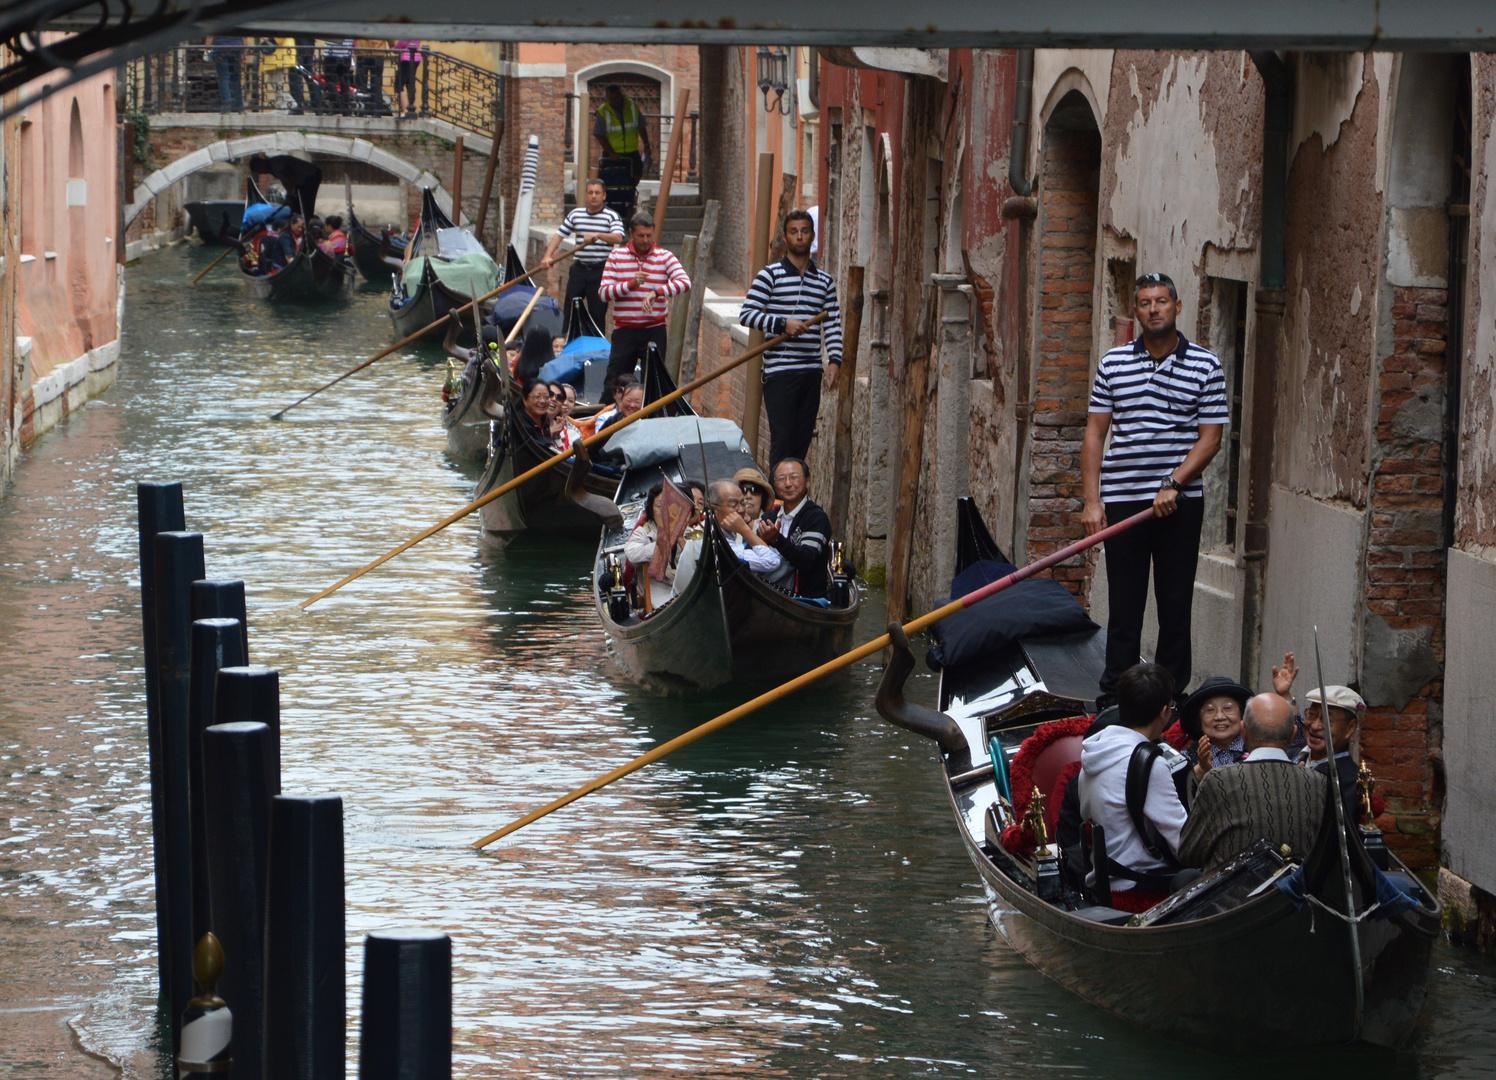 The Chinese gondola convoy